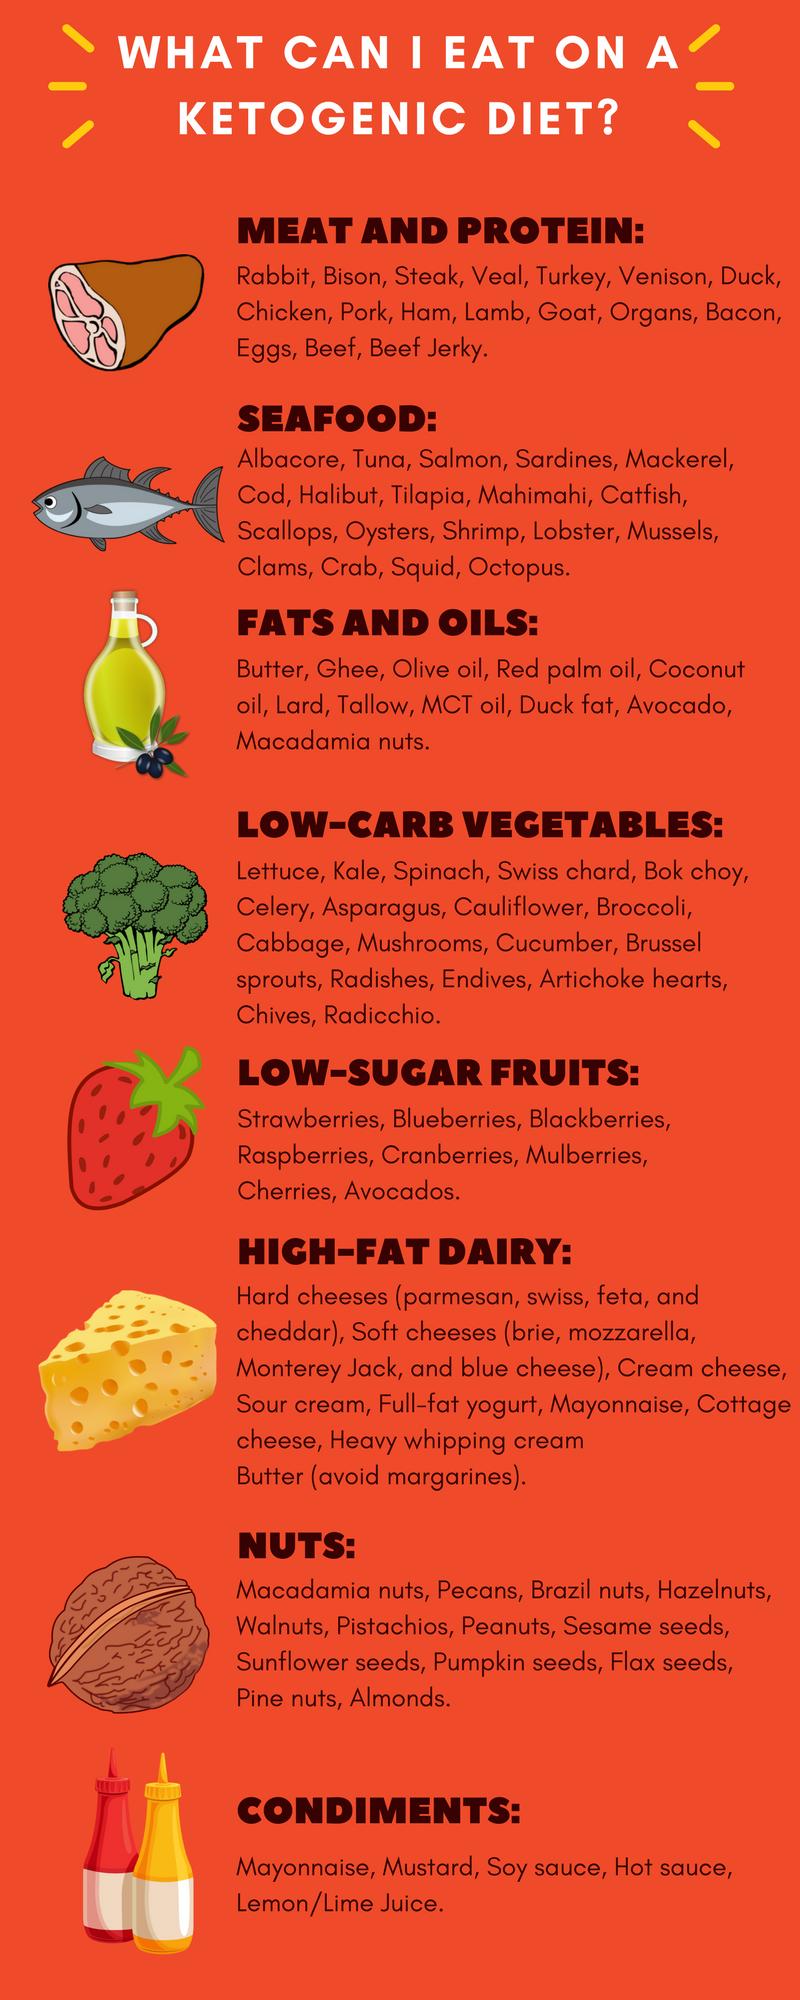 A Complete Keto Diet Guide For Beginners Keto Diet Recipes Ketogenic Diet Keto Diet Plan